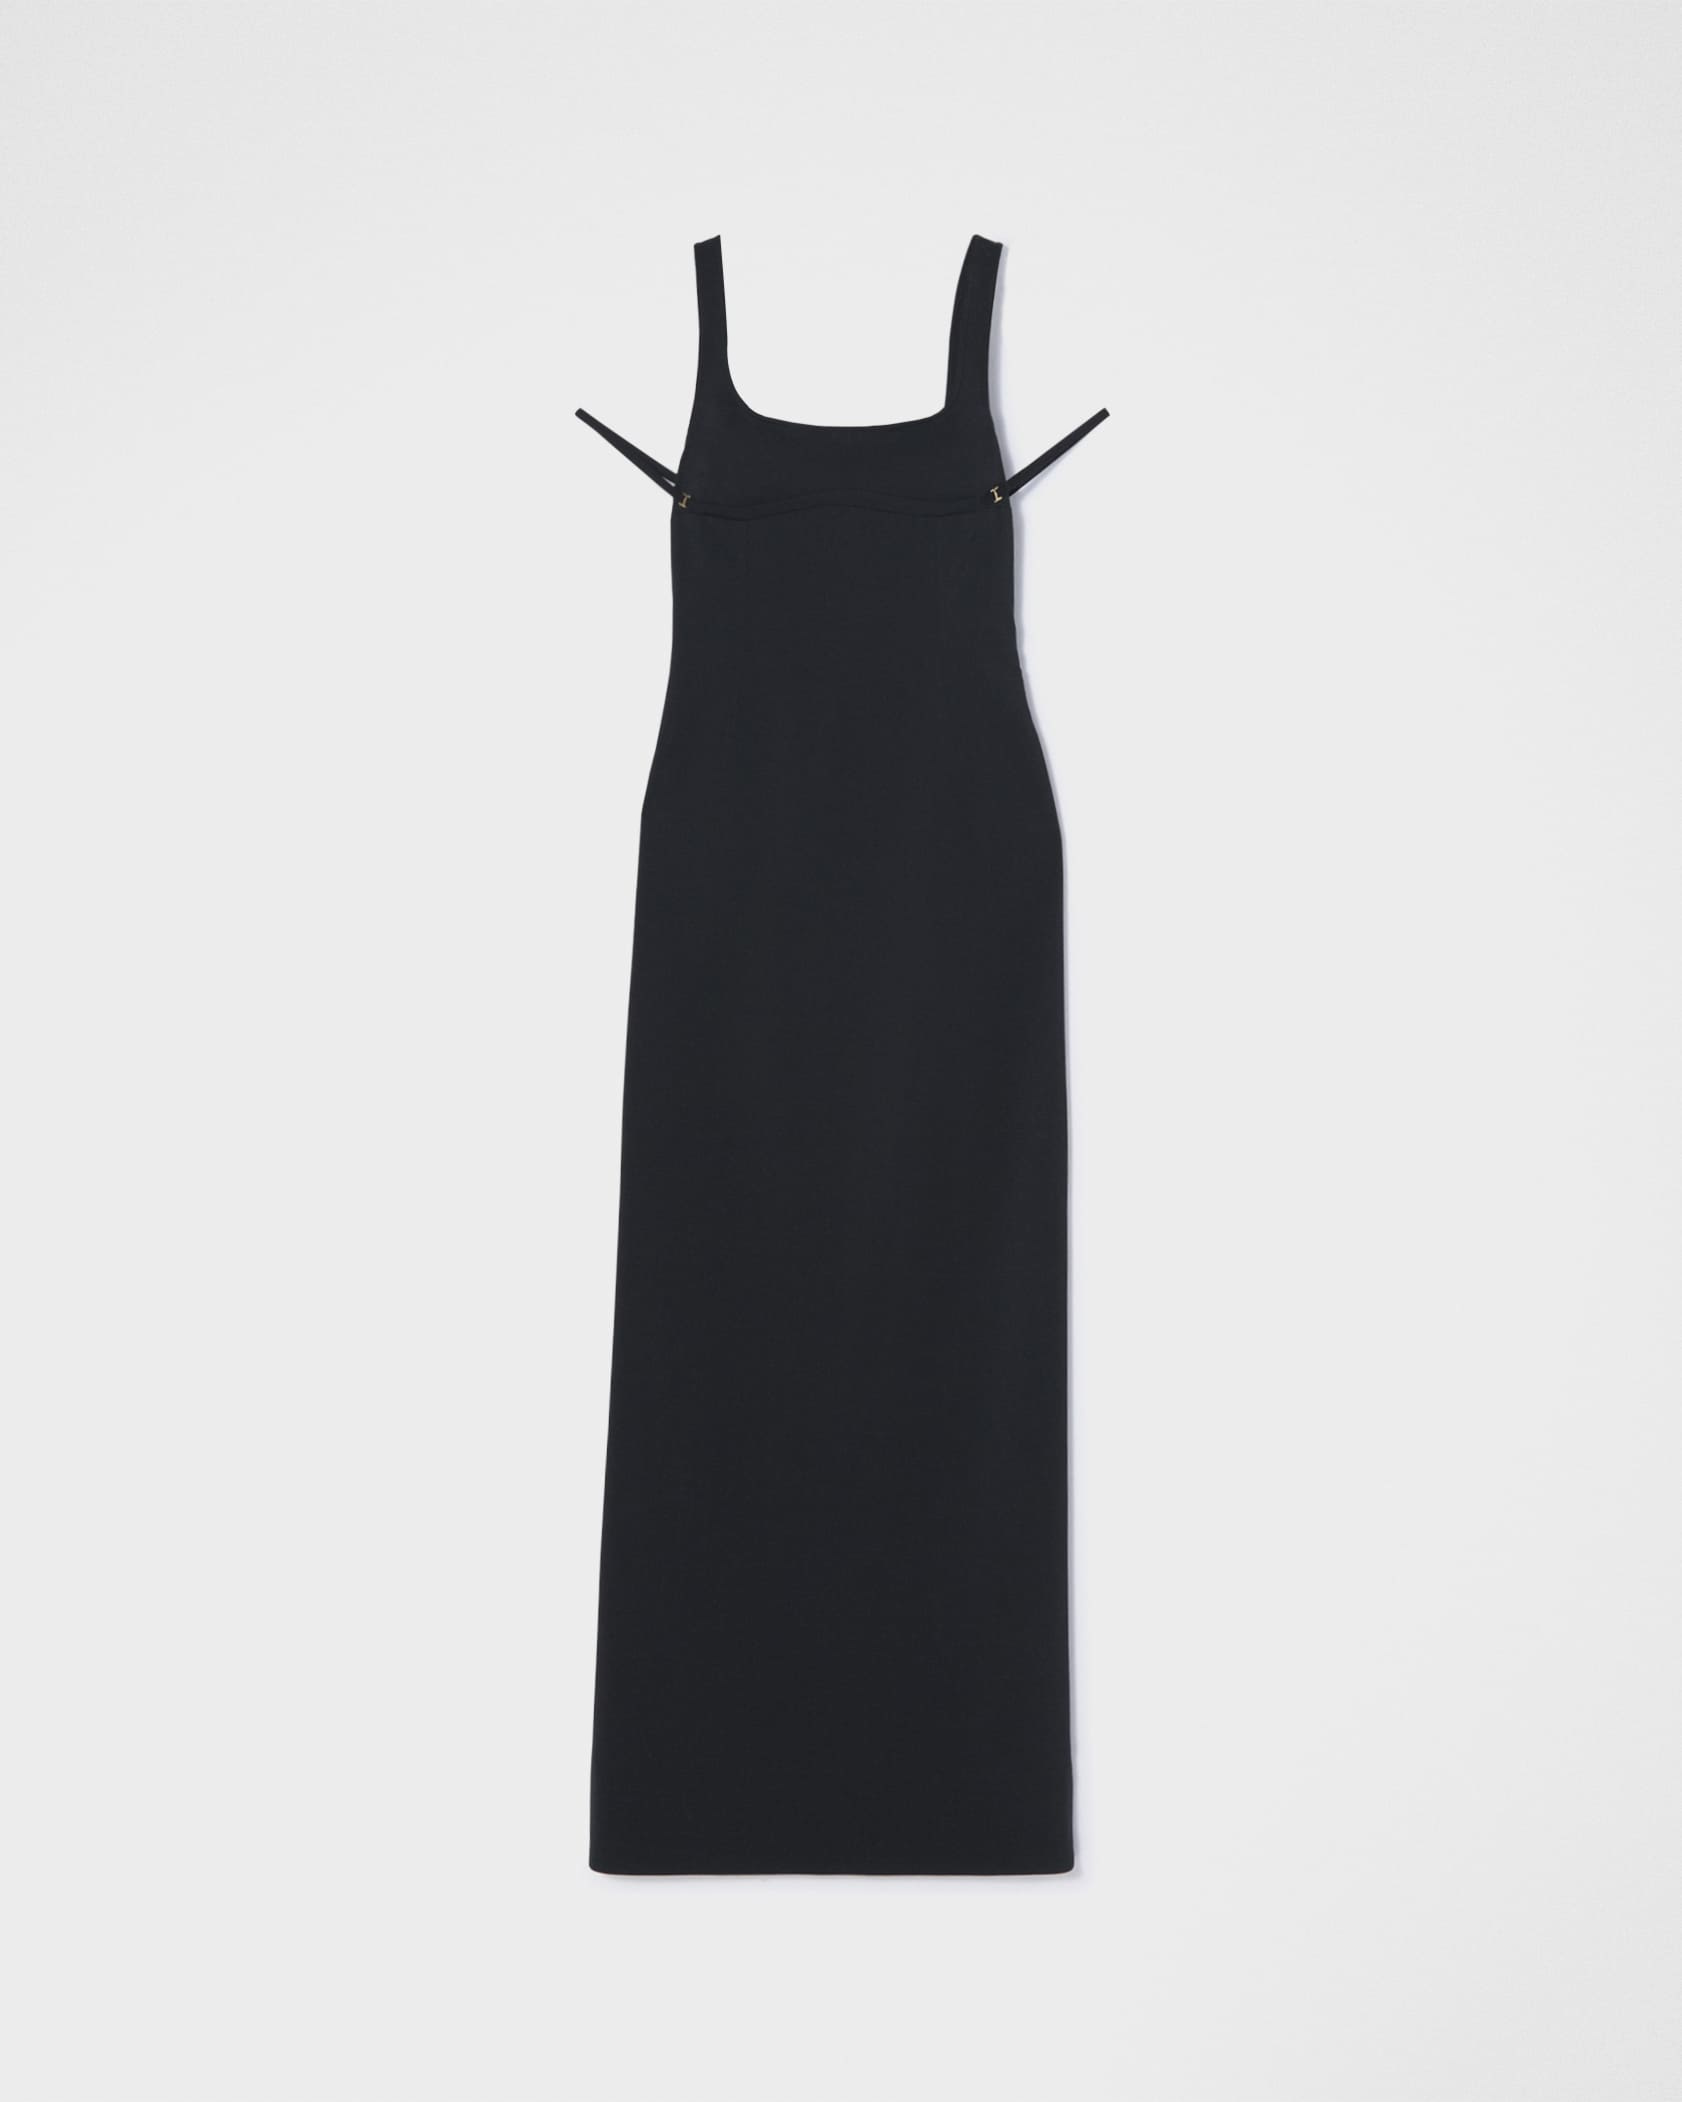 La robe Valdu